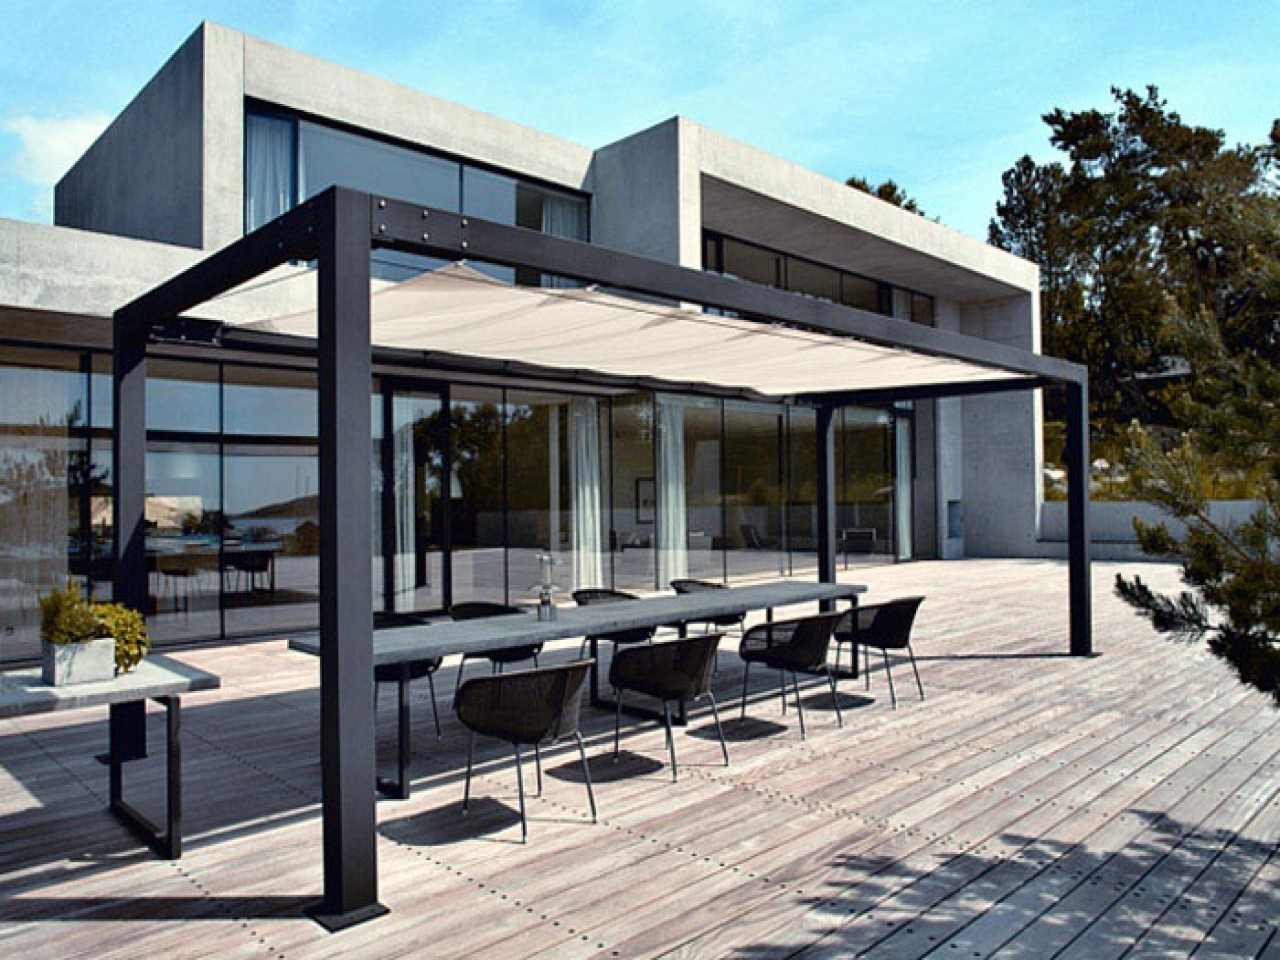 ultra-modern-steel-homes-modern-steel-frame-homes-a88524227719da96